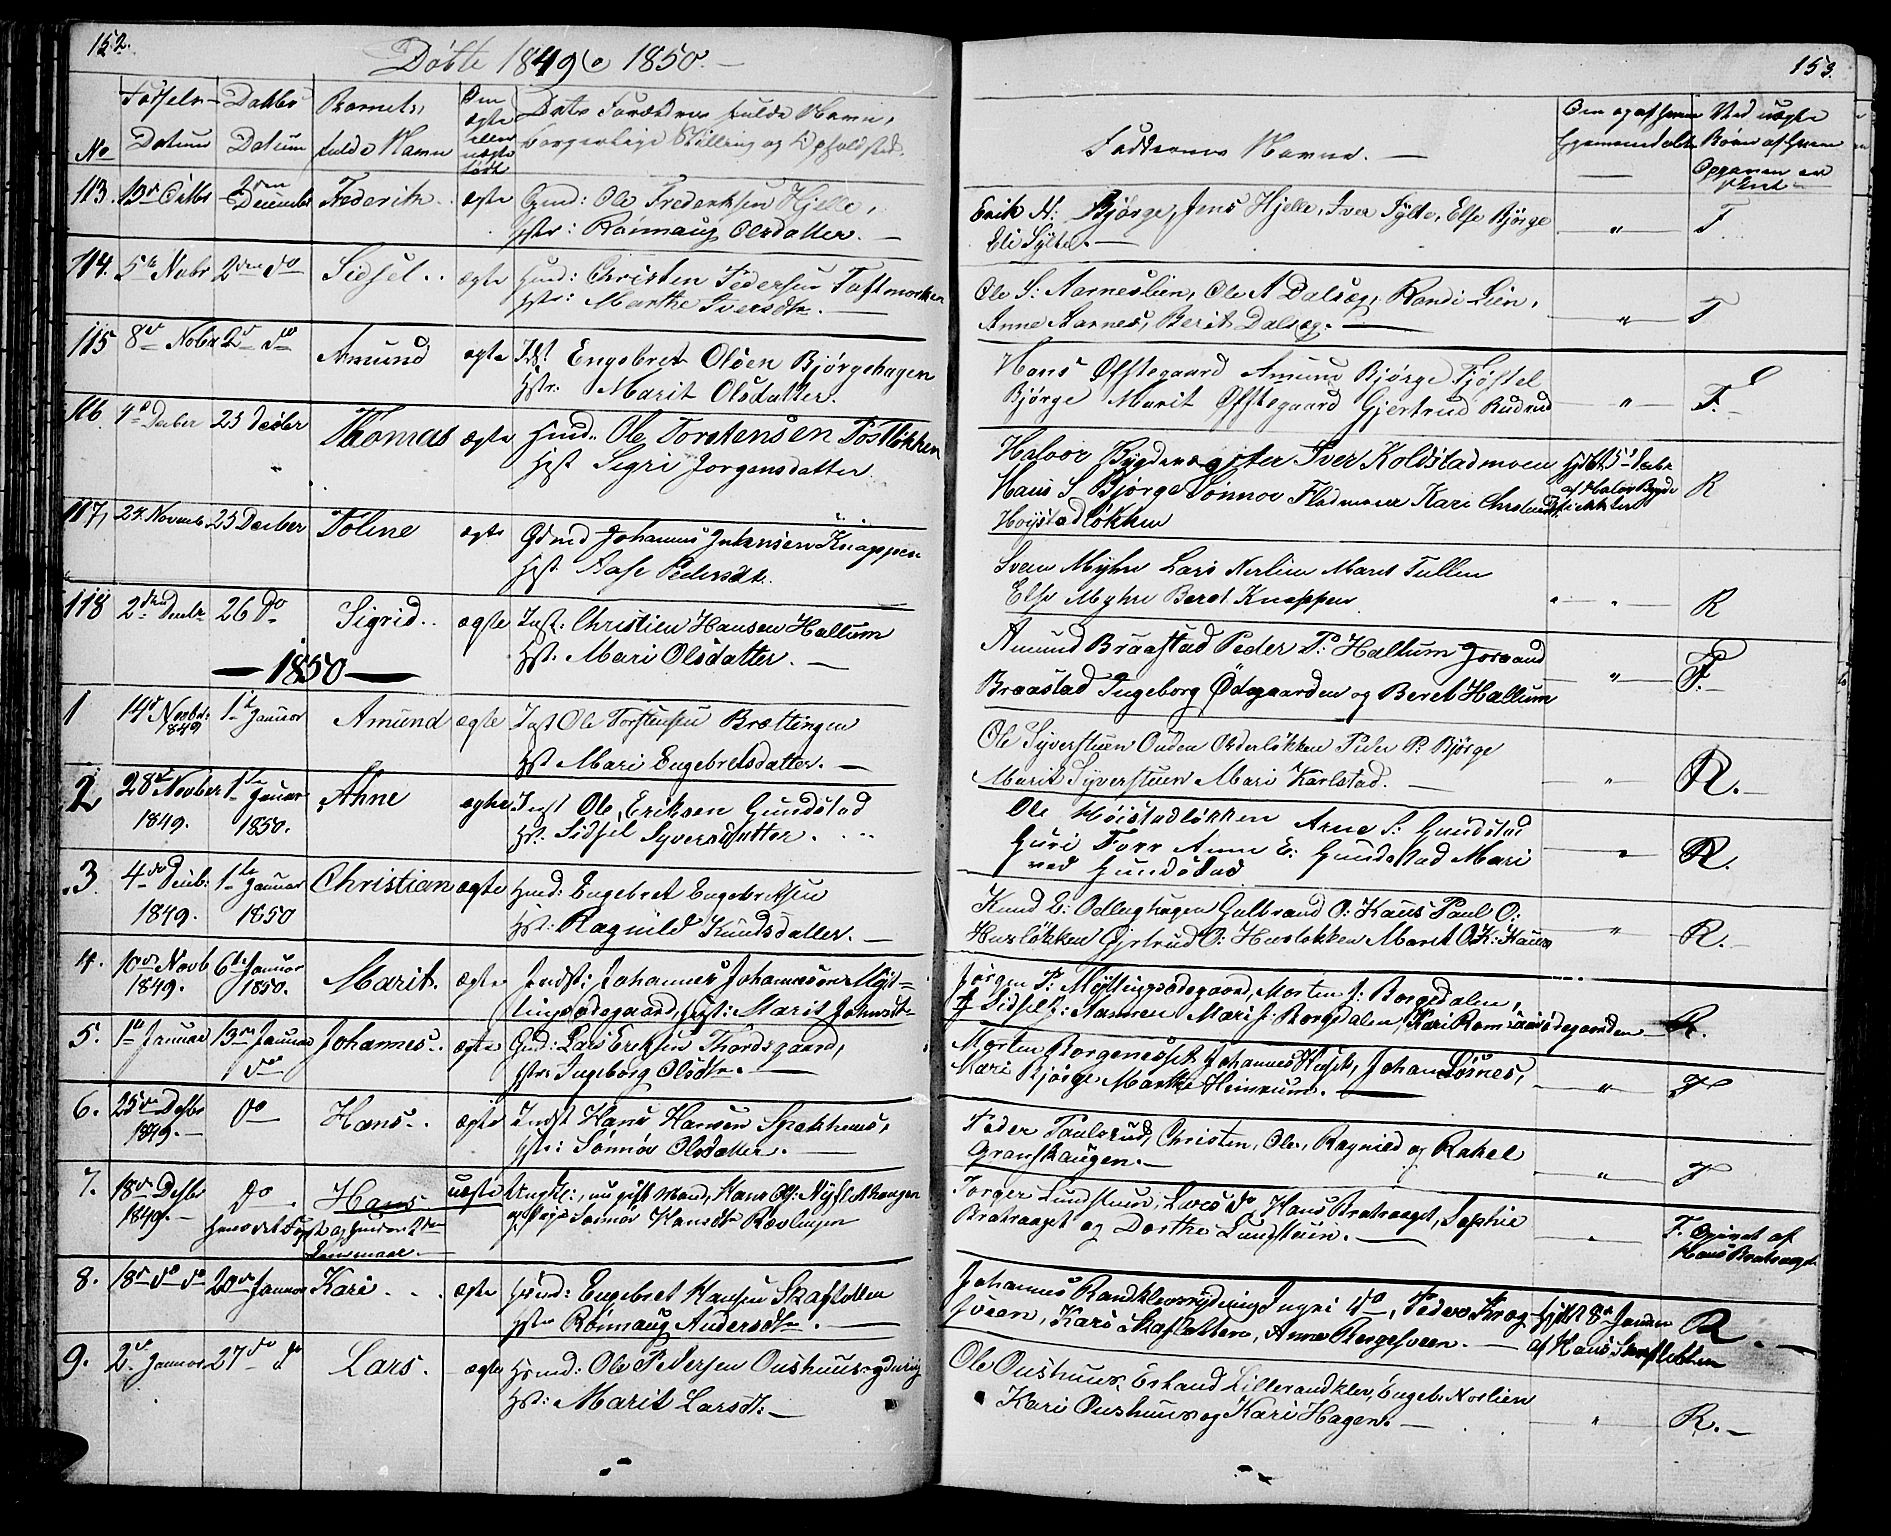 SAH, Ringebu prestekontor, Klokkerbok nr. 2, 1839-1853, s. 152-153